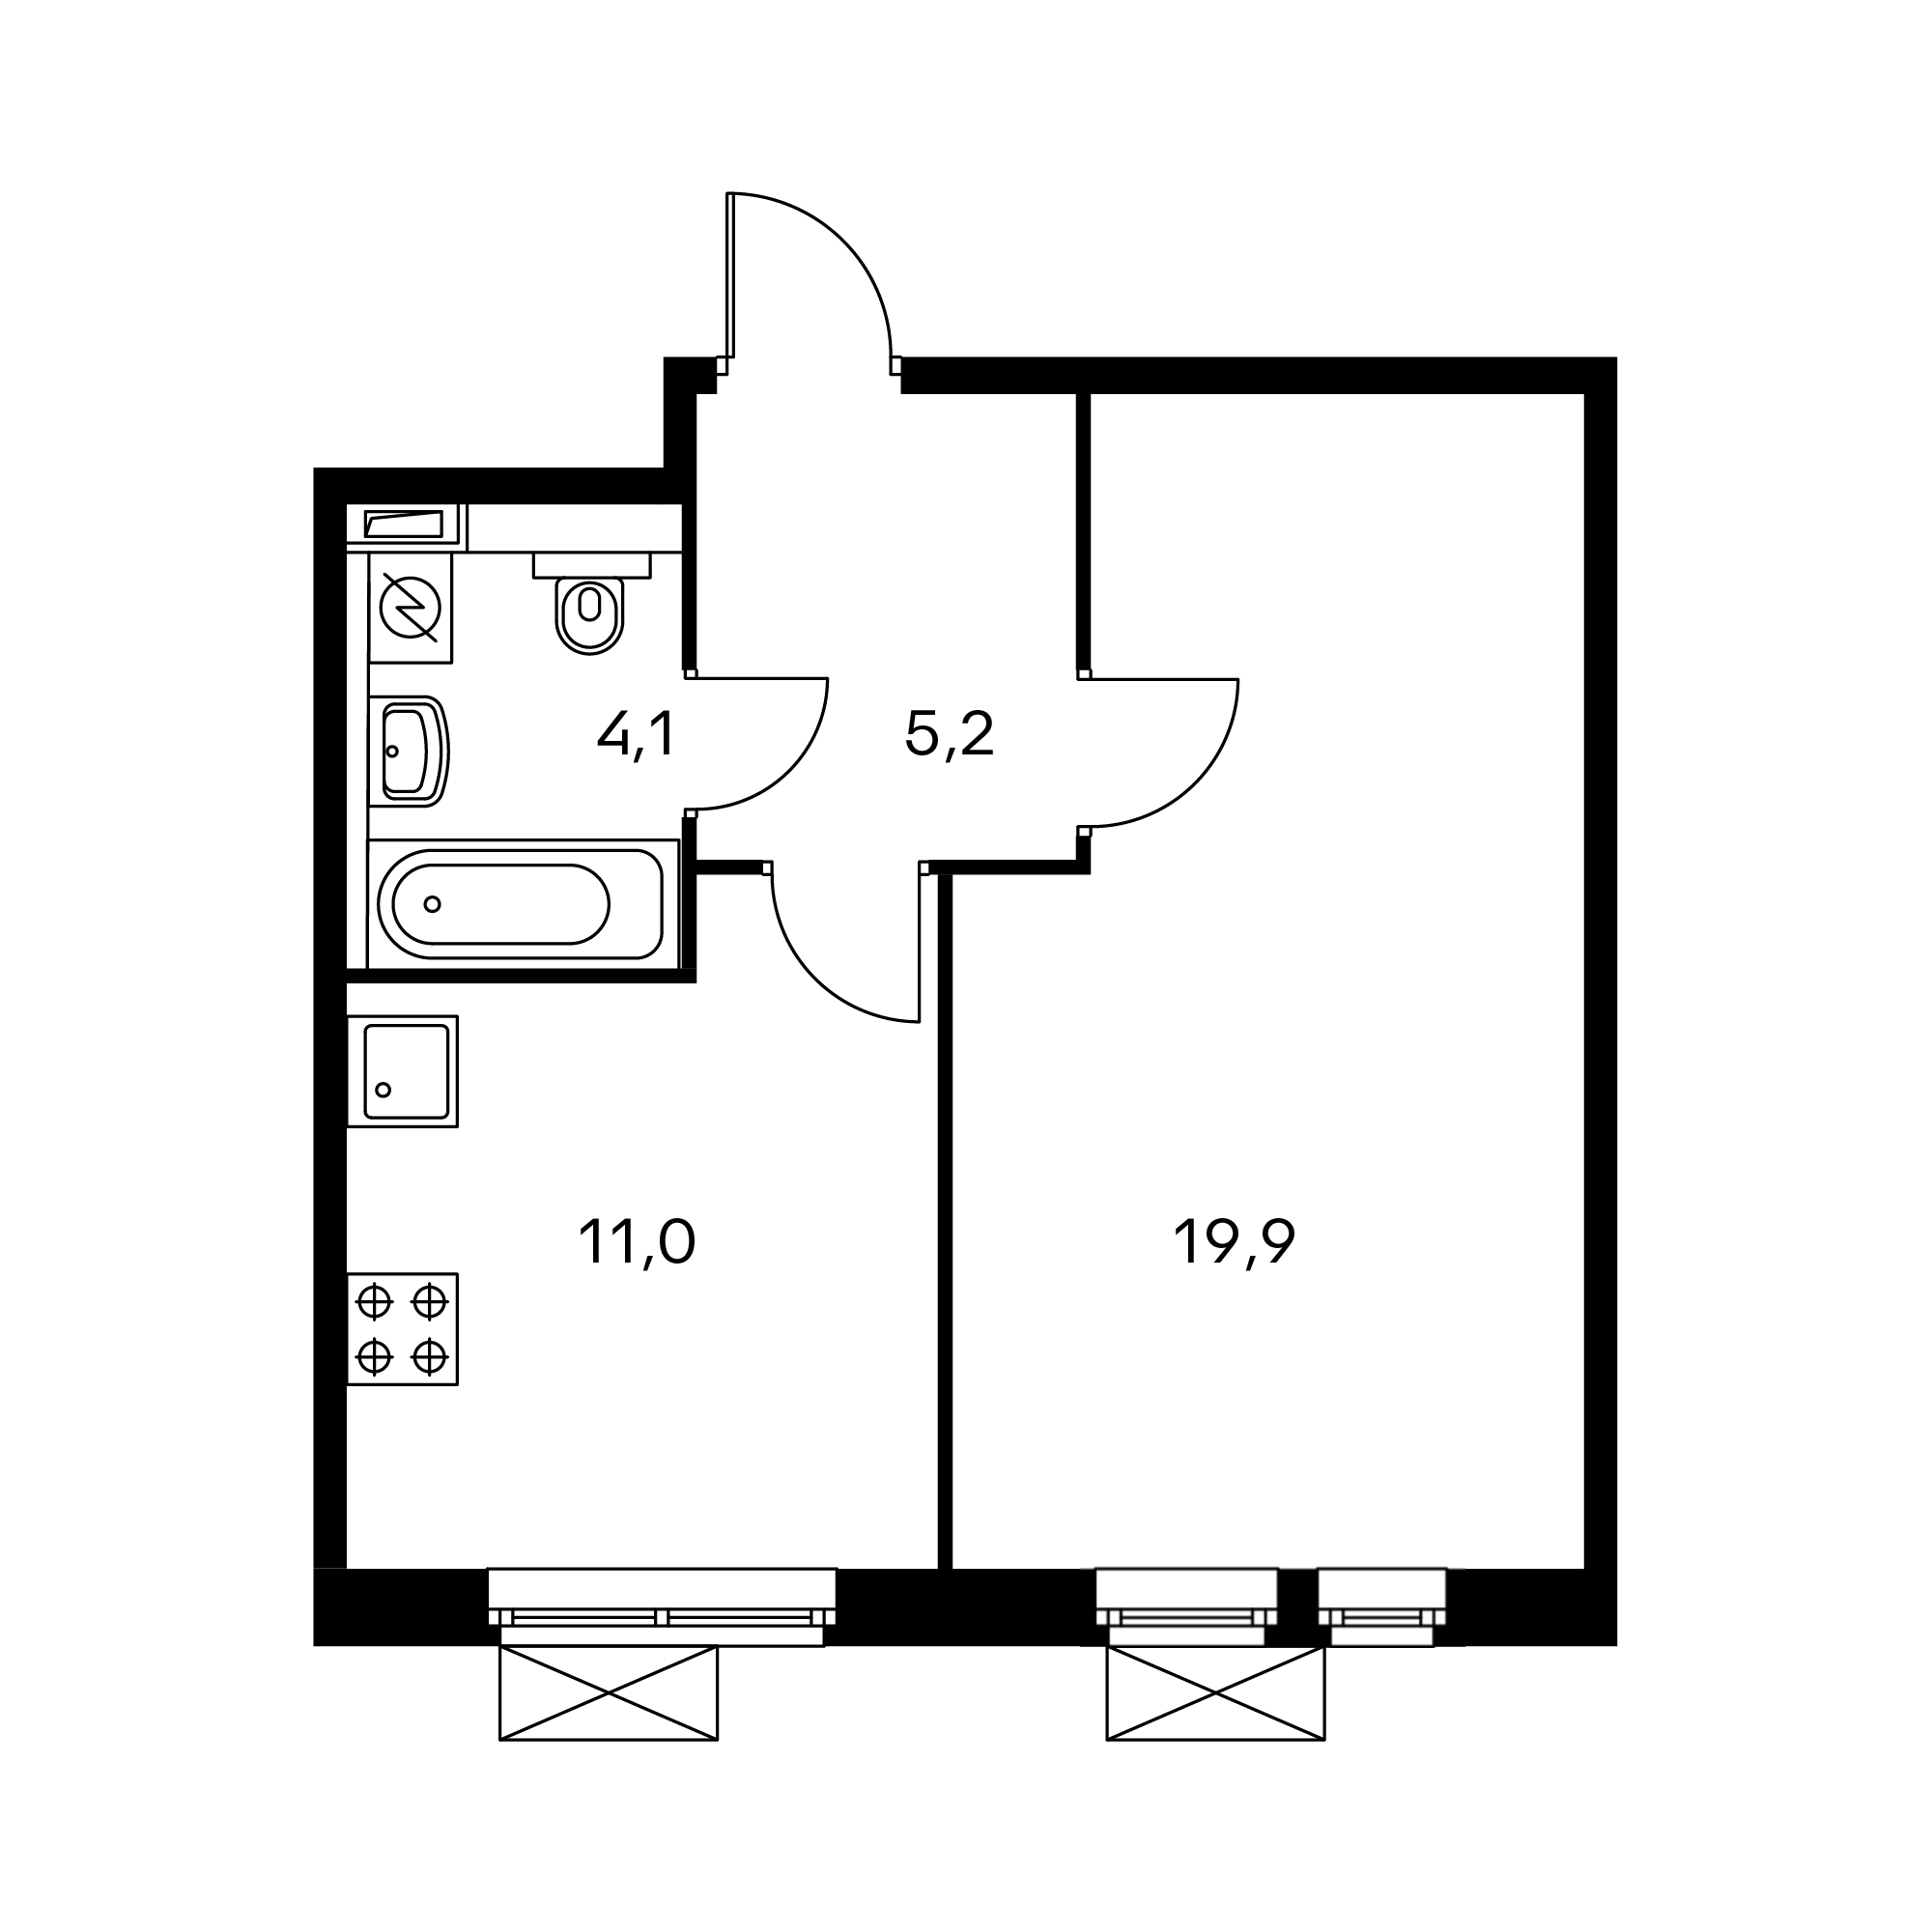 1KM1_6.9-2*